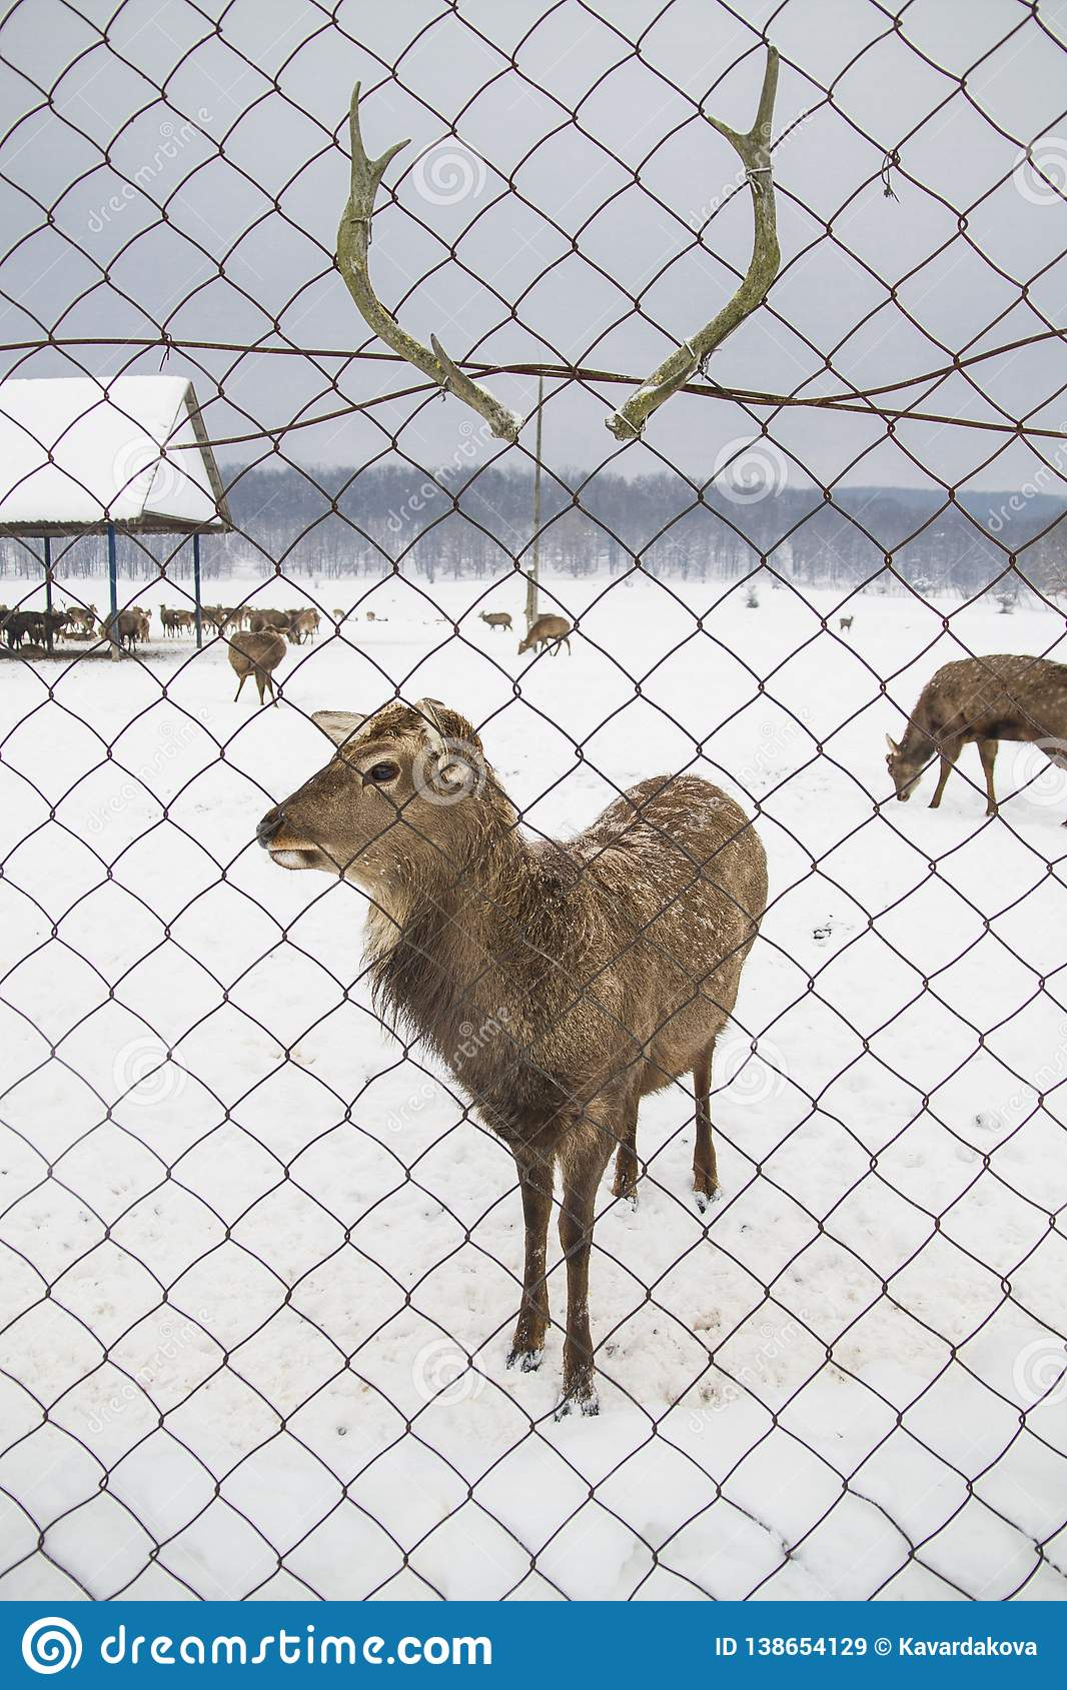 Deer against the background of their antler